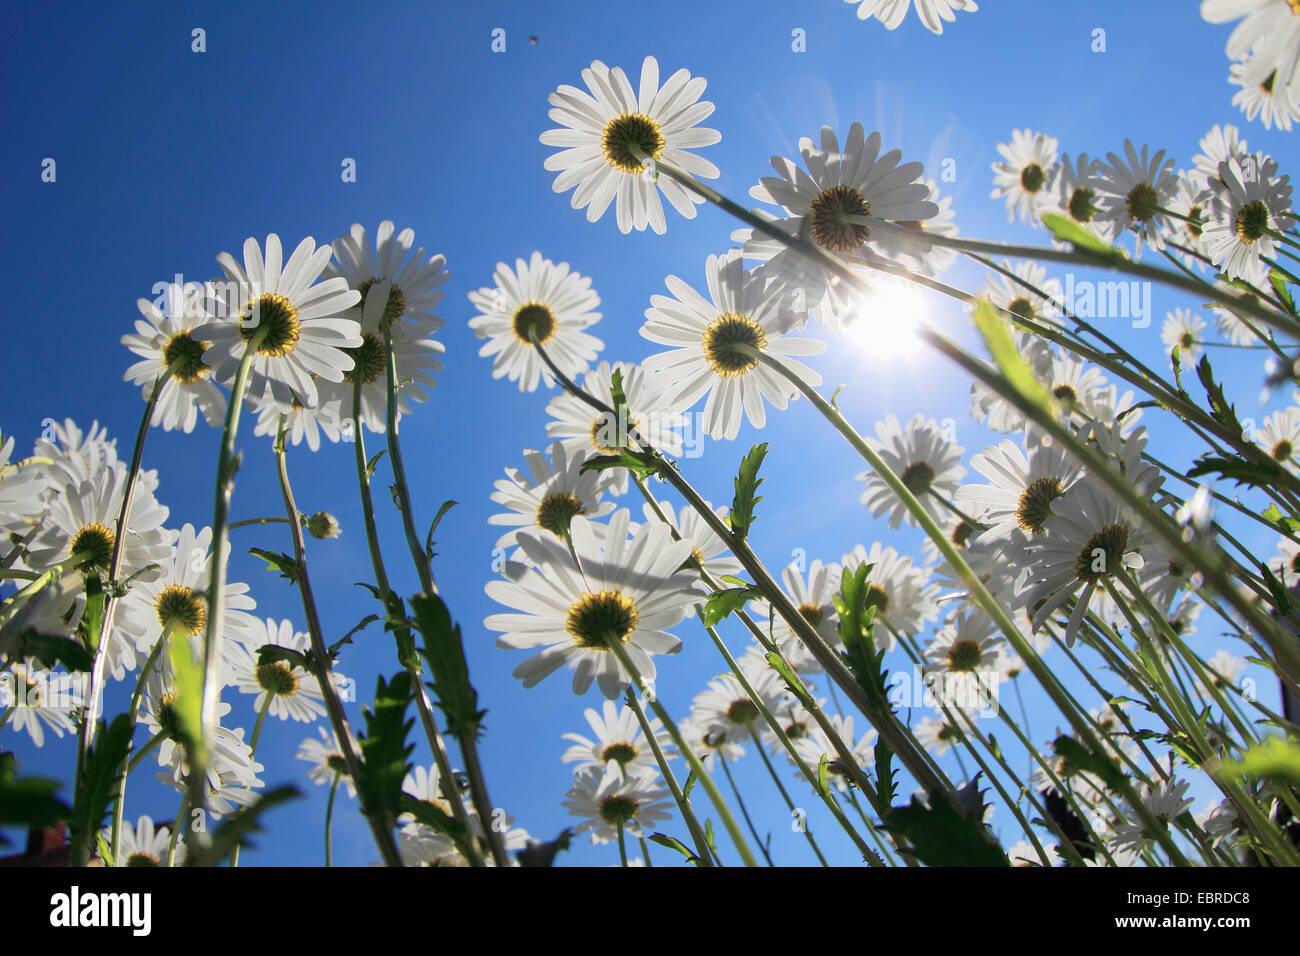 shasta daisy (Leucanthemum maximum), low angle shot of a blooming plants - Stock Image